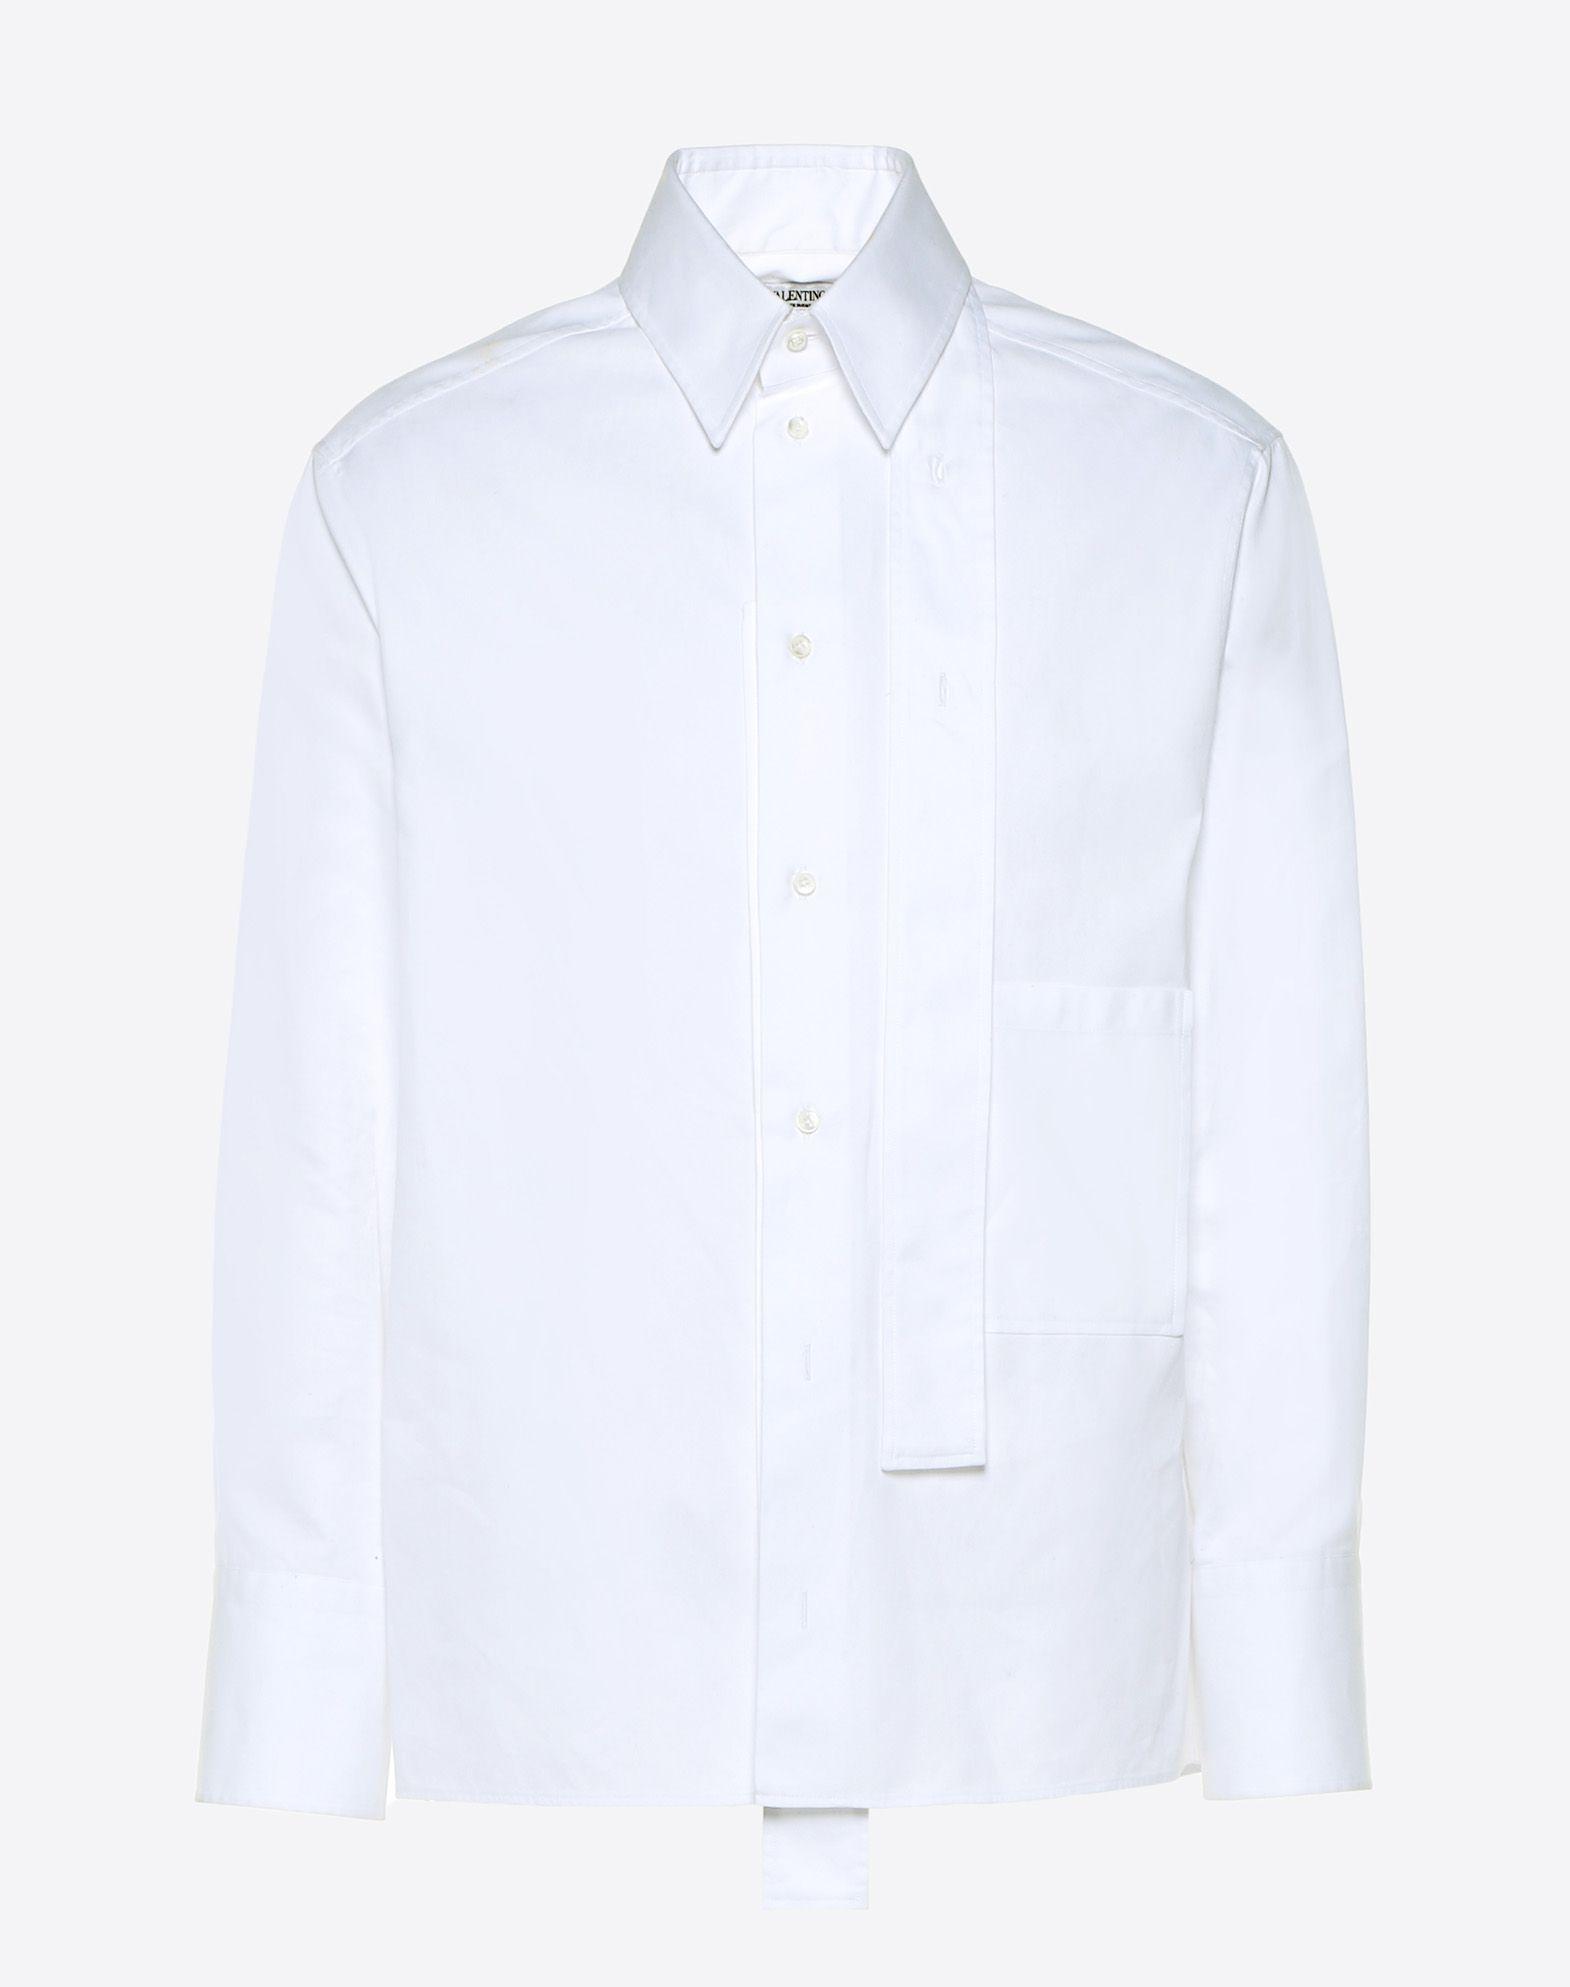 VALENTINO No appliqués Plain weave Solid colour Classic Neckline Buttoned cuffs Button closing  38723533hf